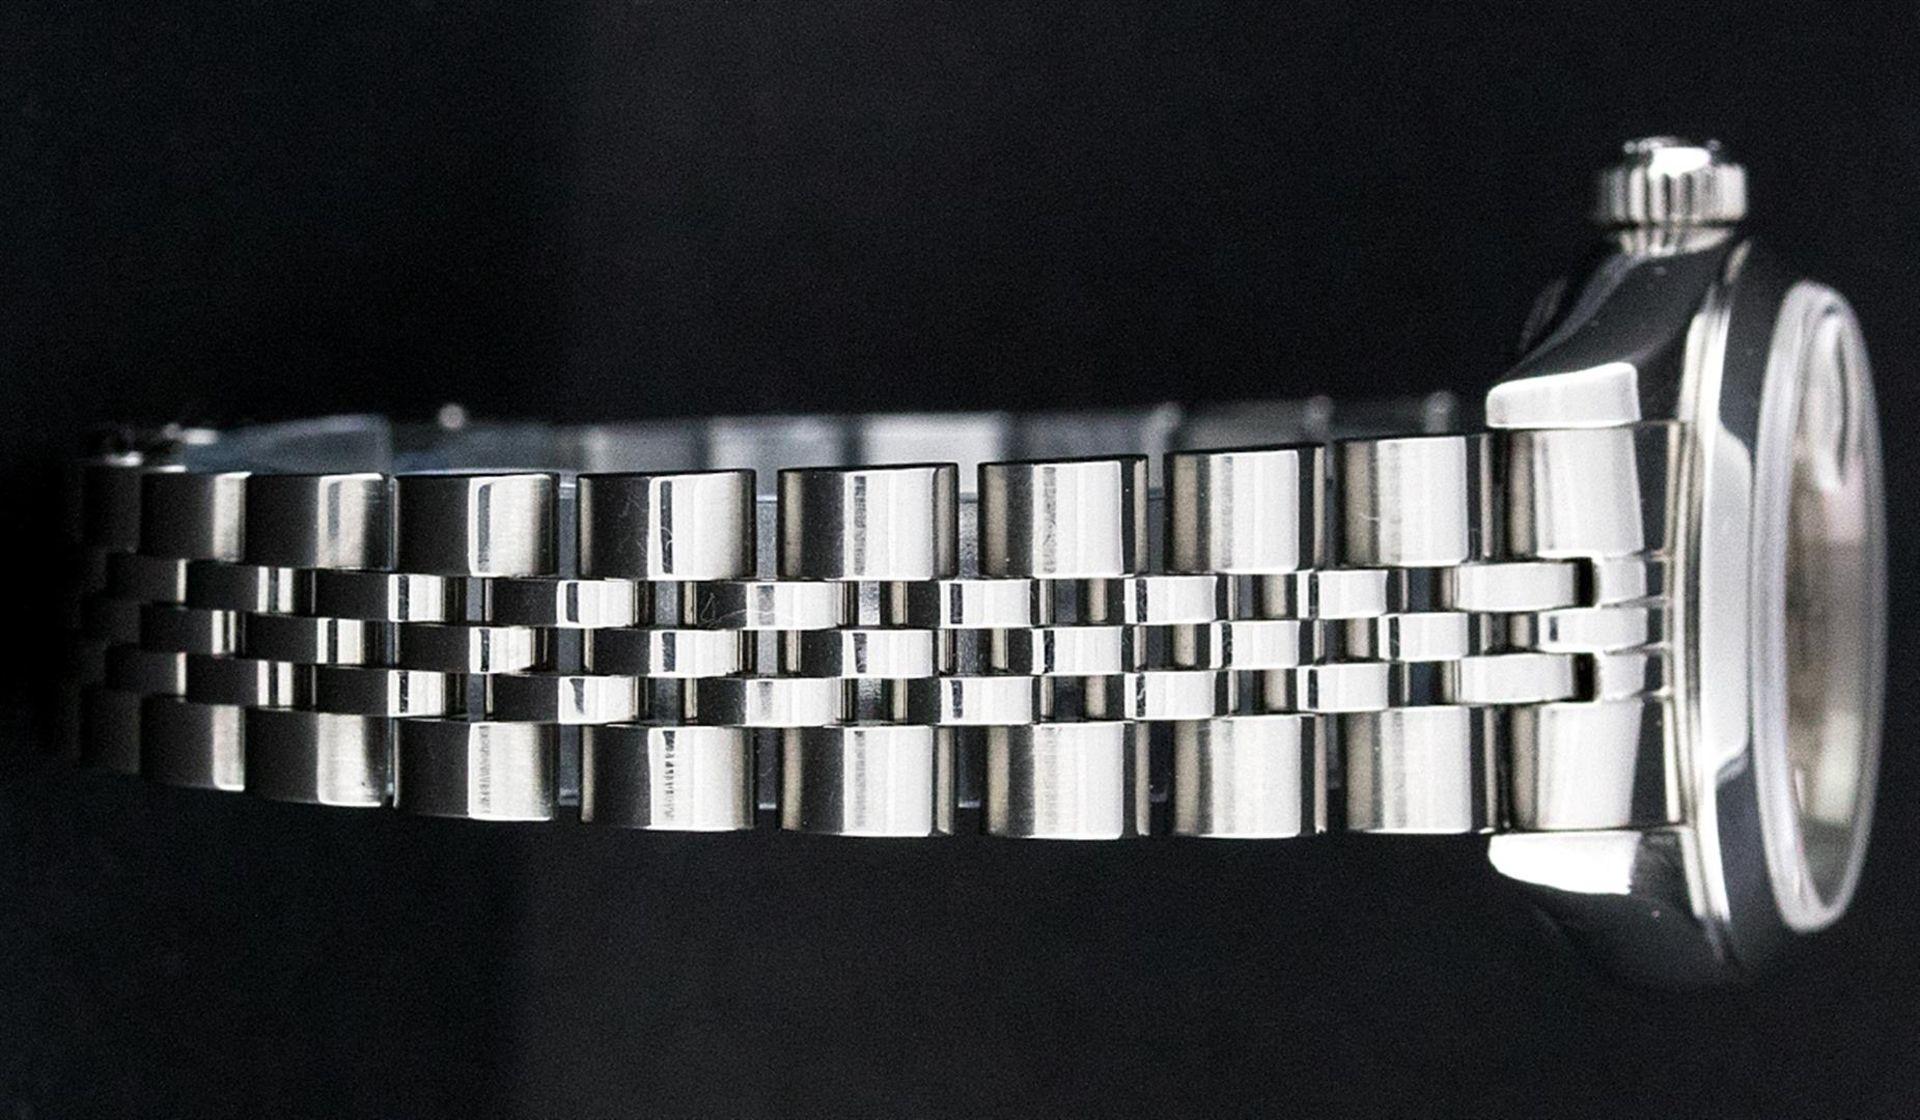 Rolex Ladies Stainless Steel Silver Index 26MM Quickset Datejust Wristwatch - Image 5 of 9